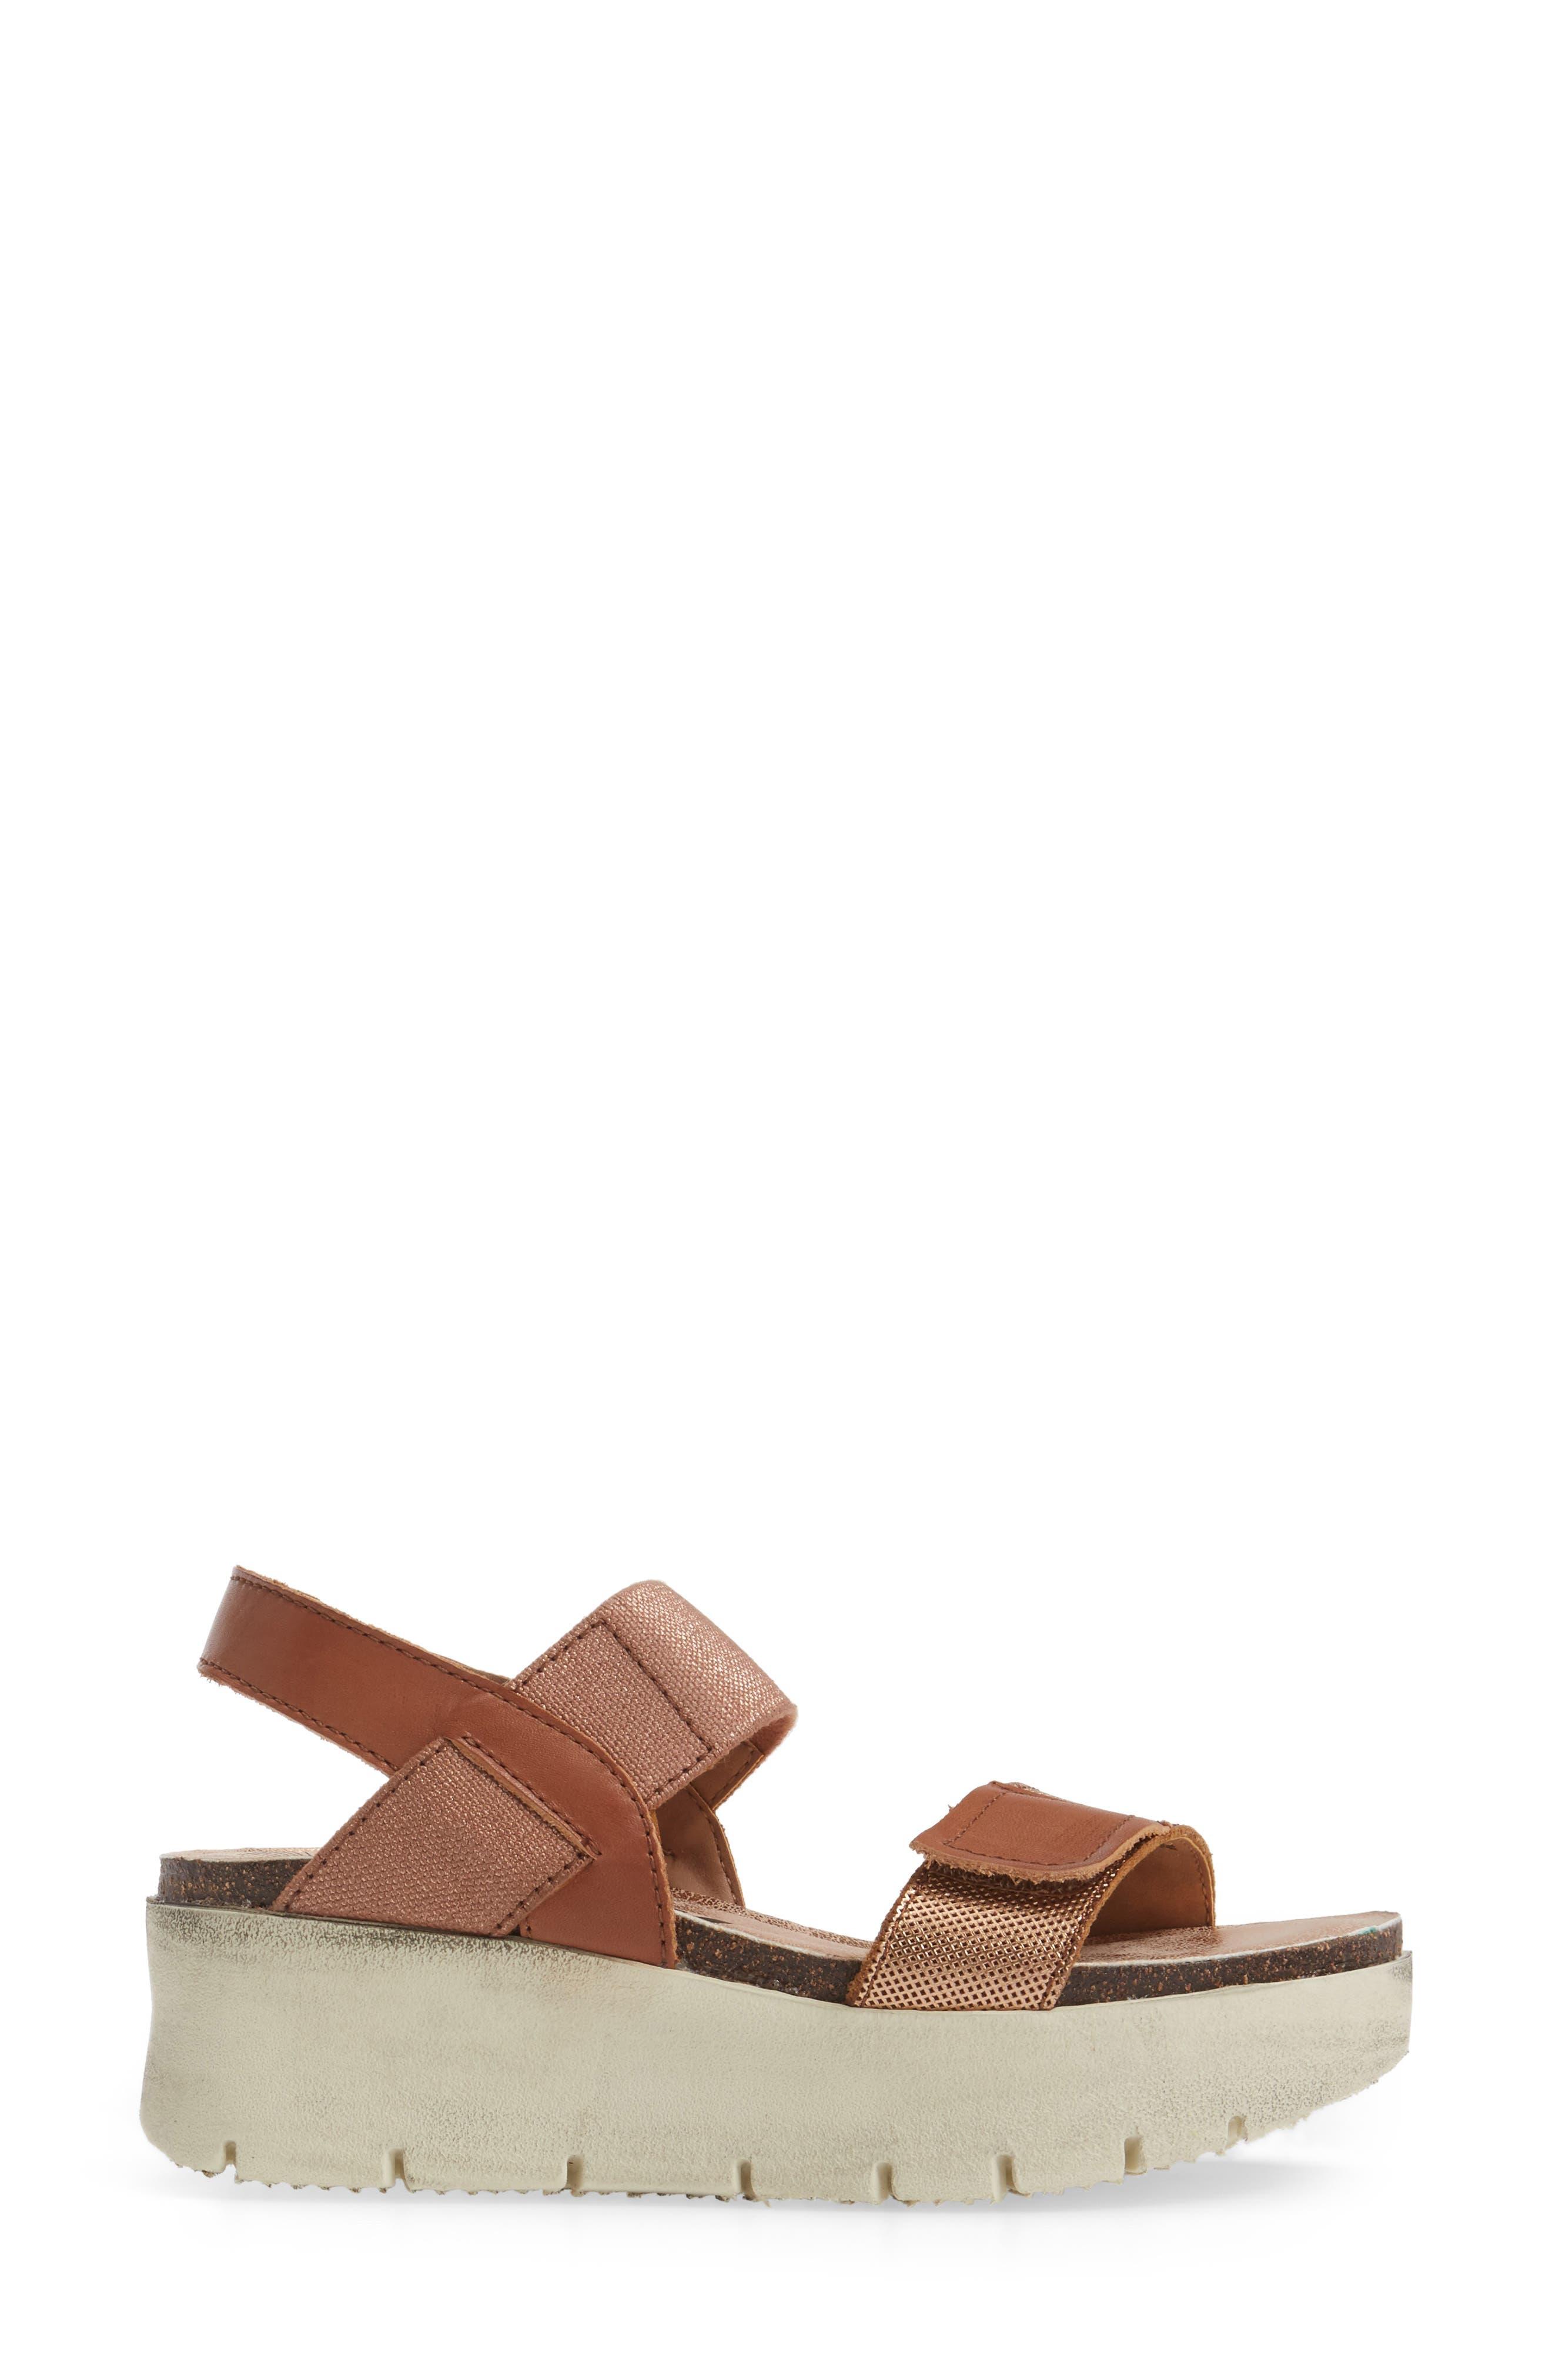 Nova Platform Sandal,                             Alternate thumbnail 3, color,                             Copper Leather